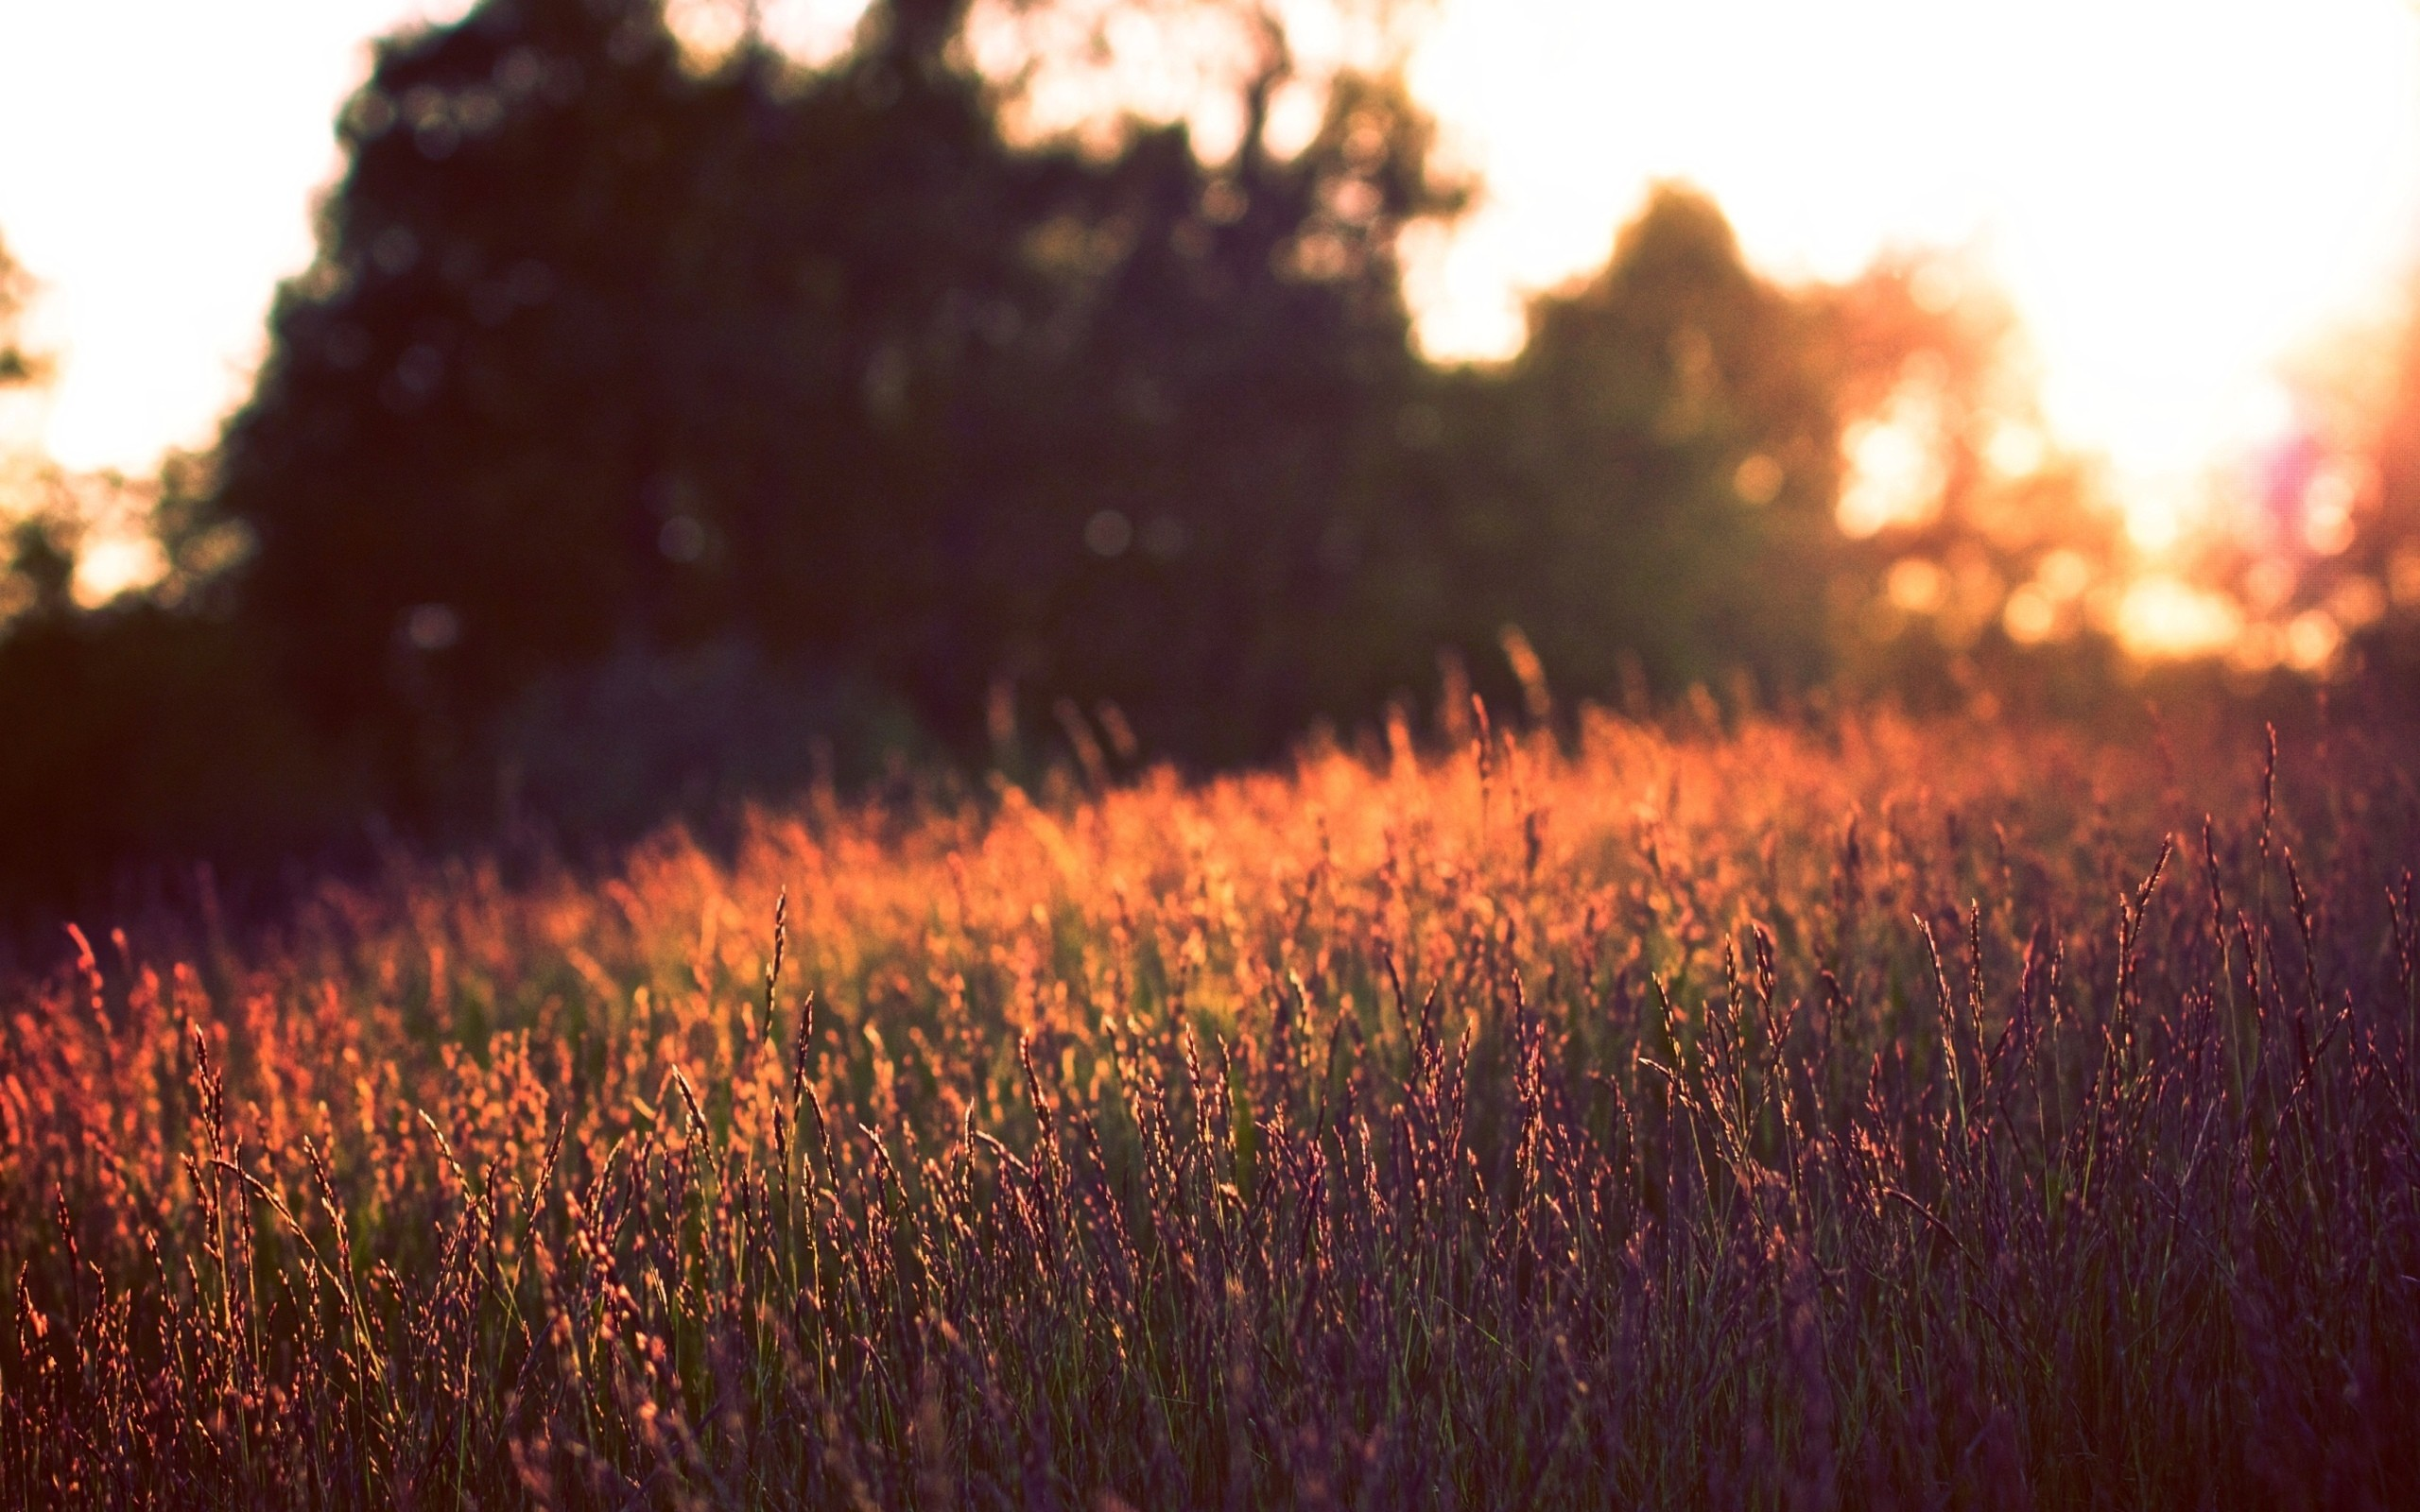 закат, лето, природа, солнце скачать